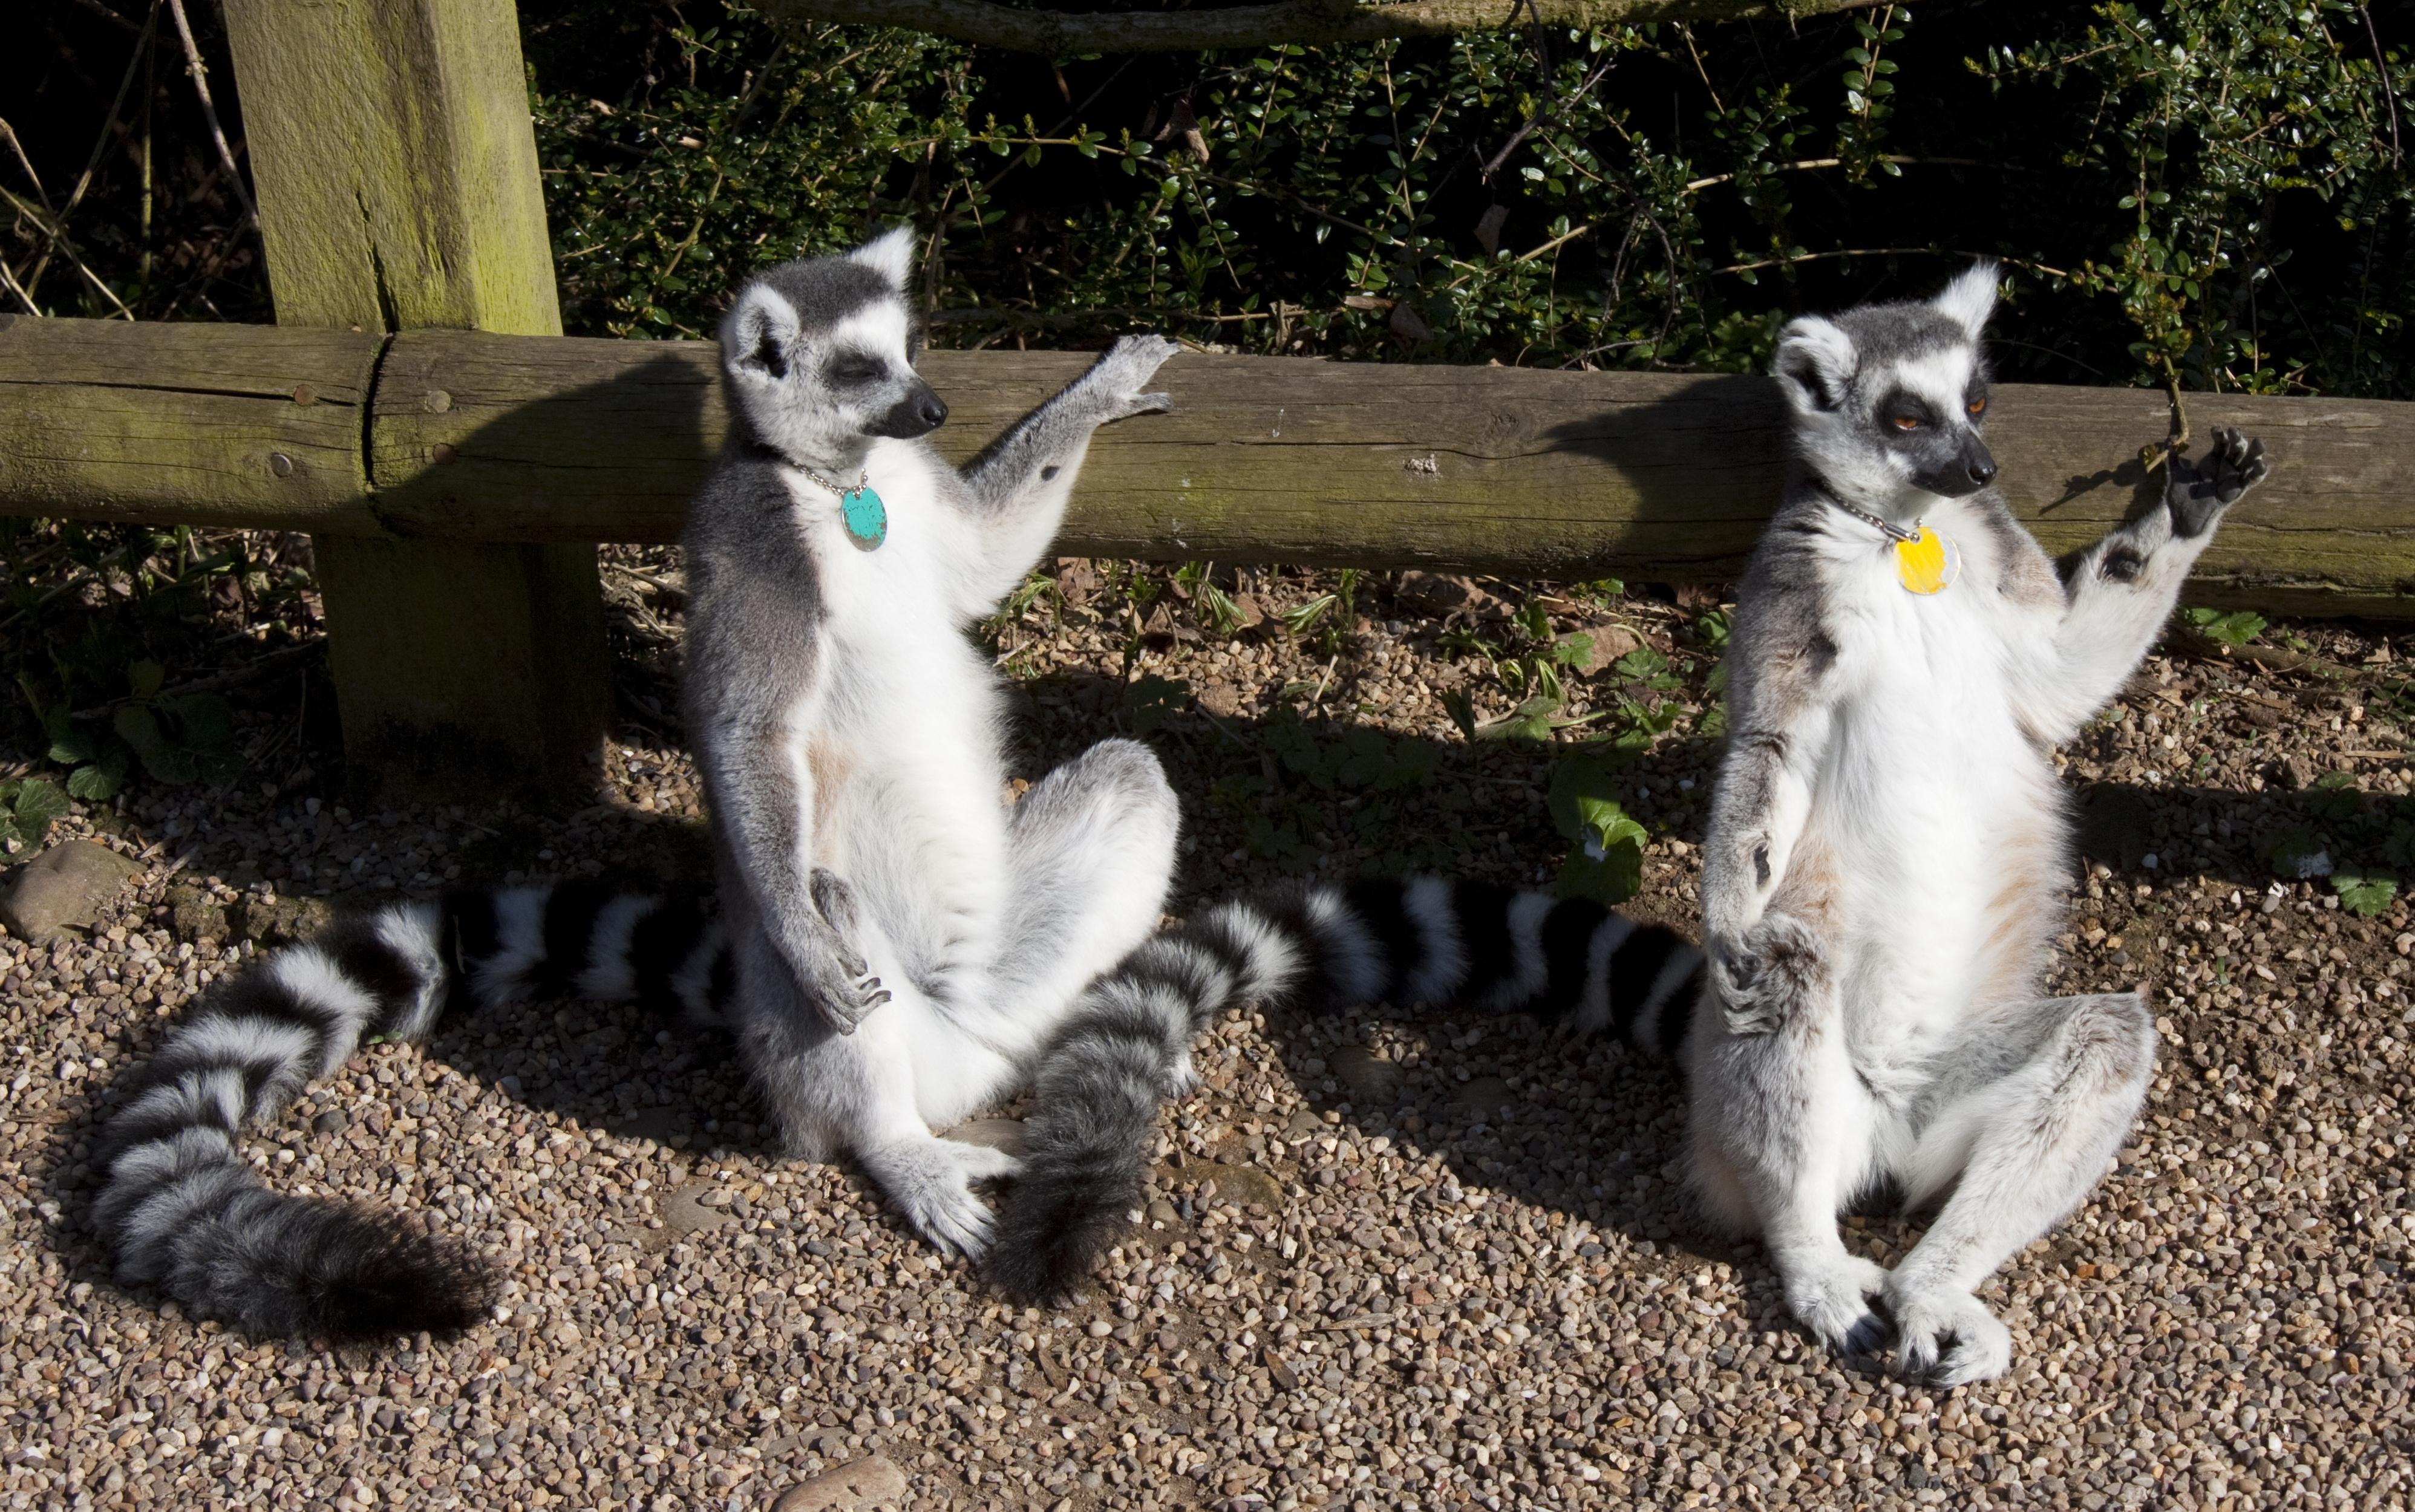 What Ring Tailed Lemurs Eat